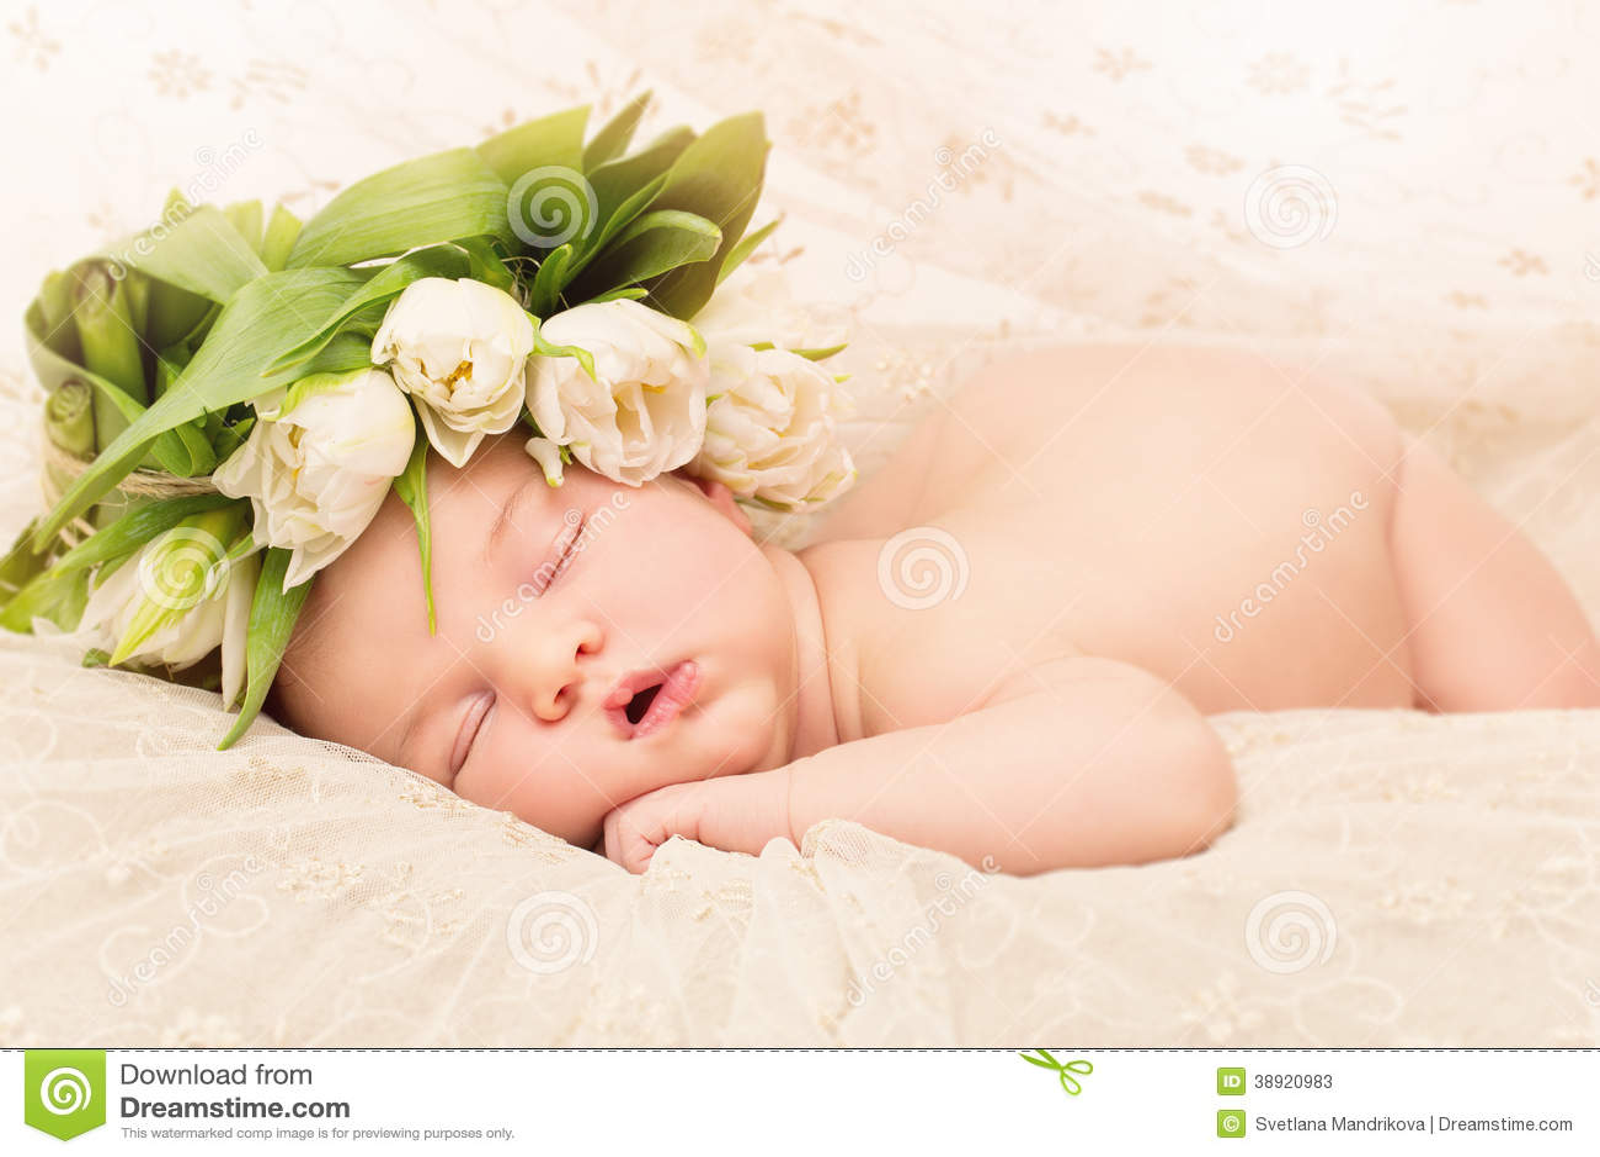 Newborn Baby With Flowers Stock Photo